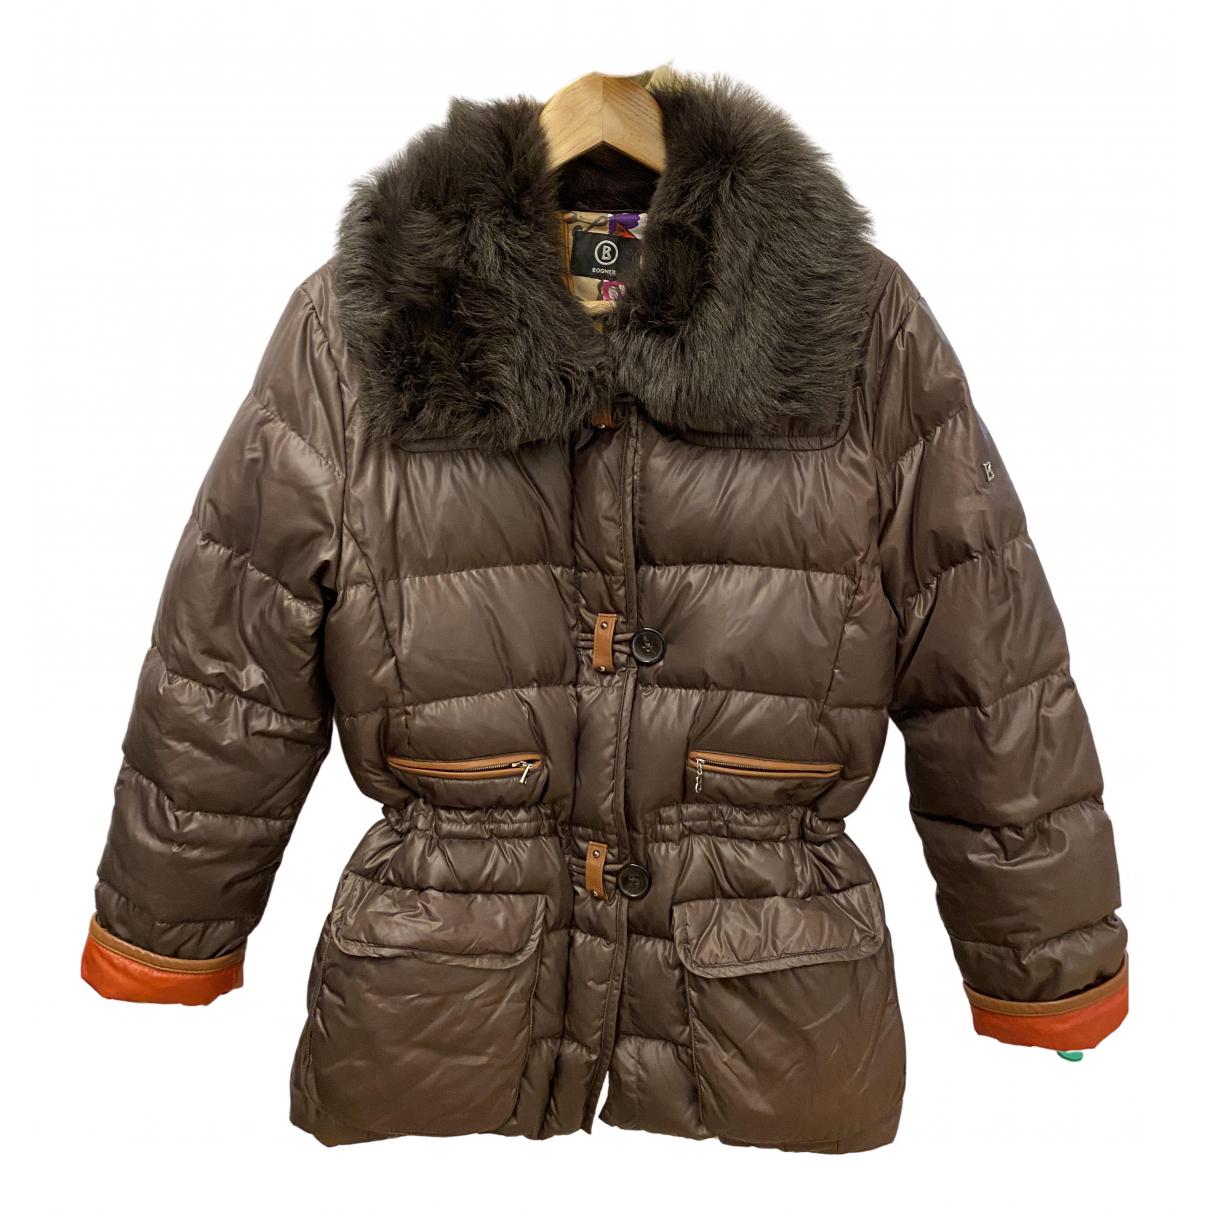 Bogner \N Brown coat for Women 10 US